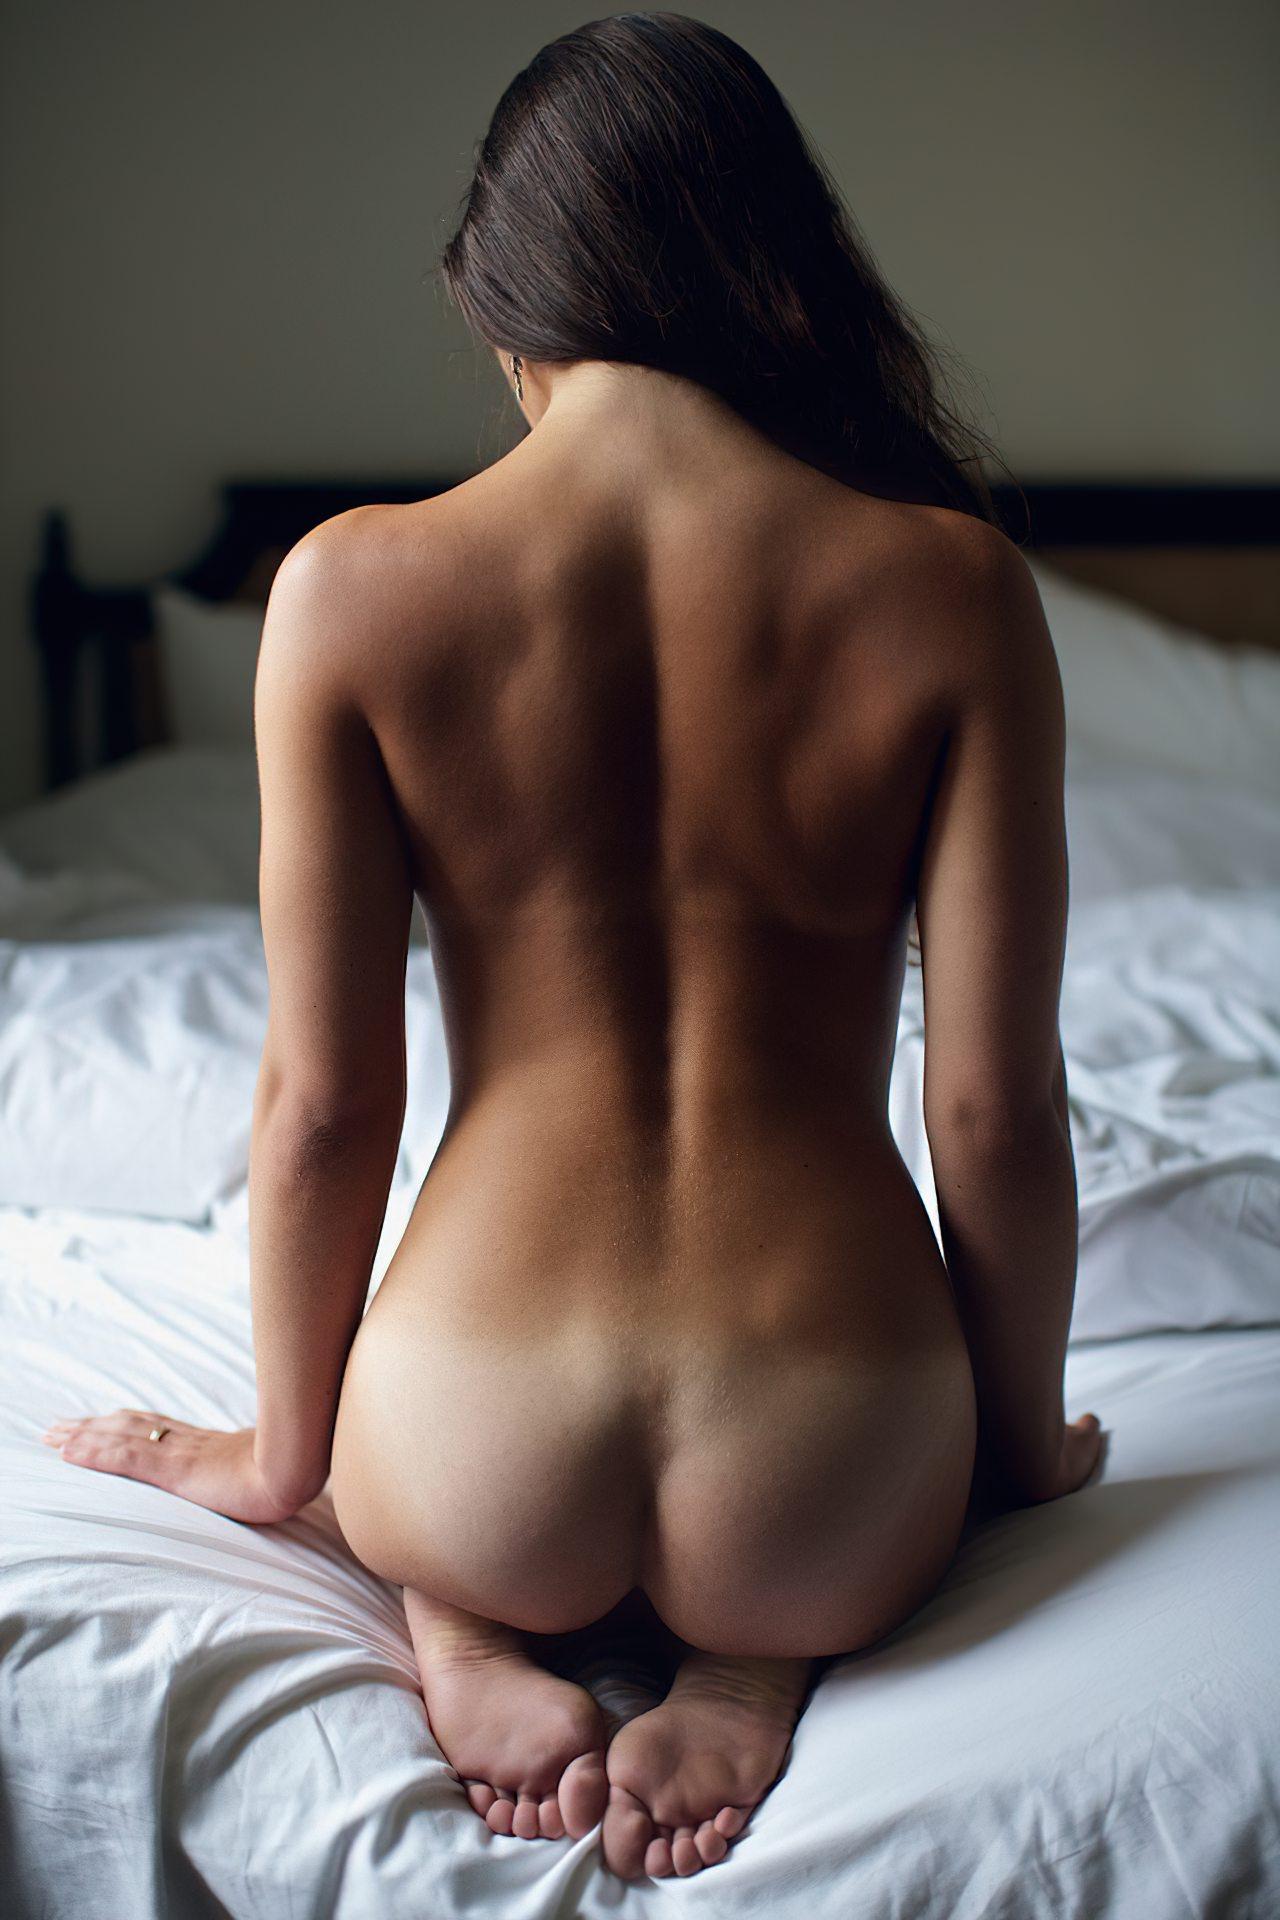 Fotos de Mulheres Despidas (20)